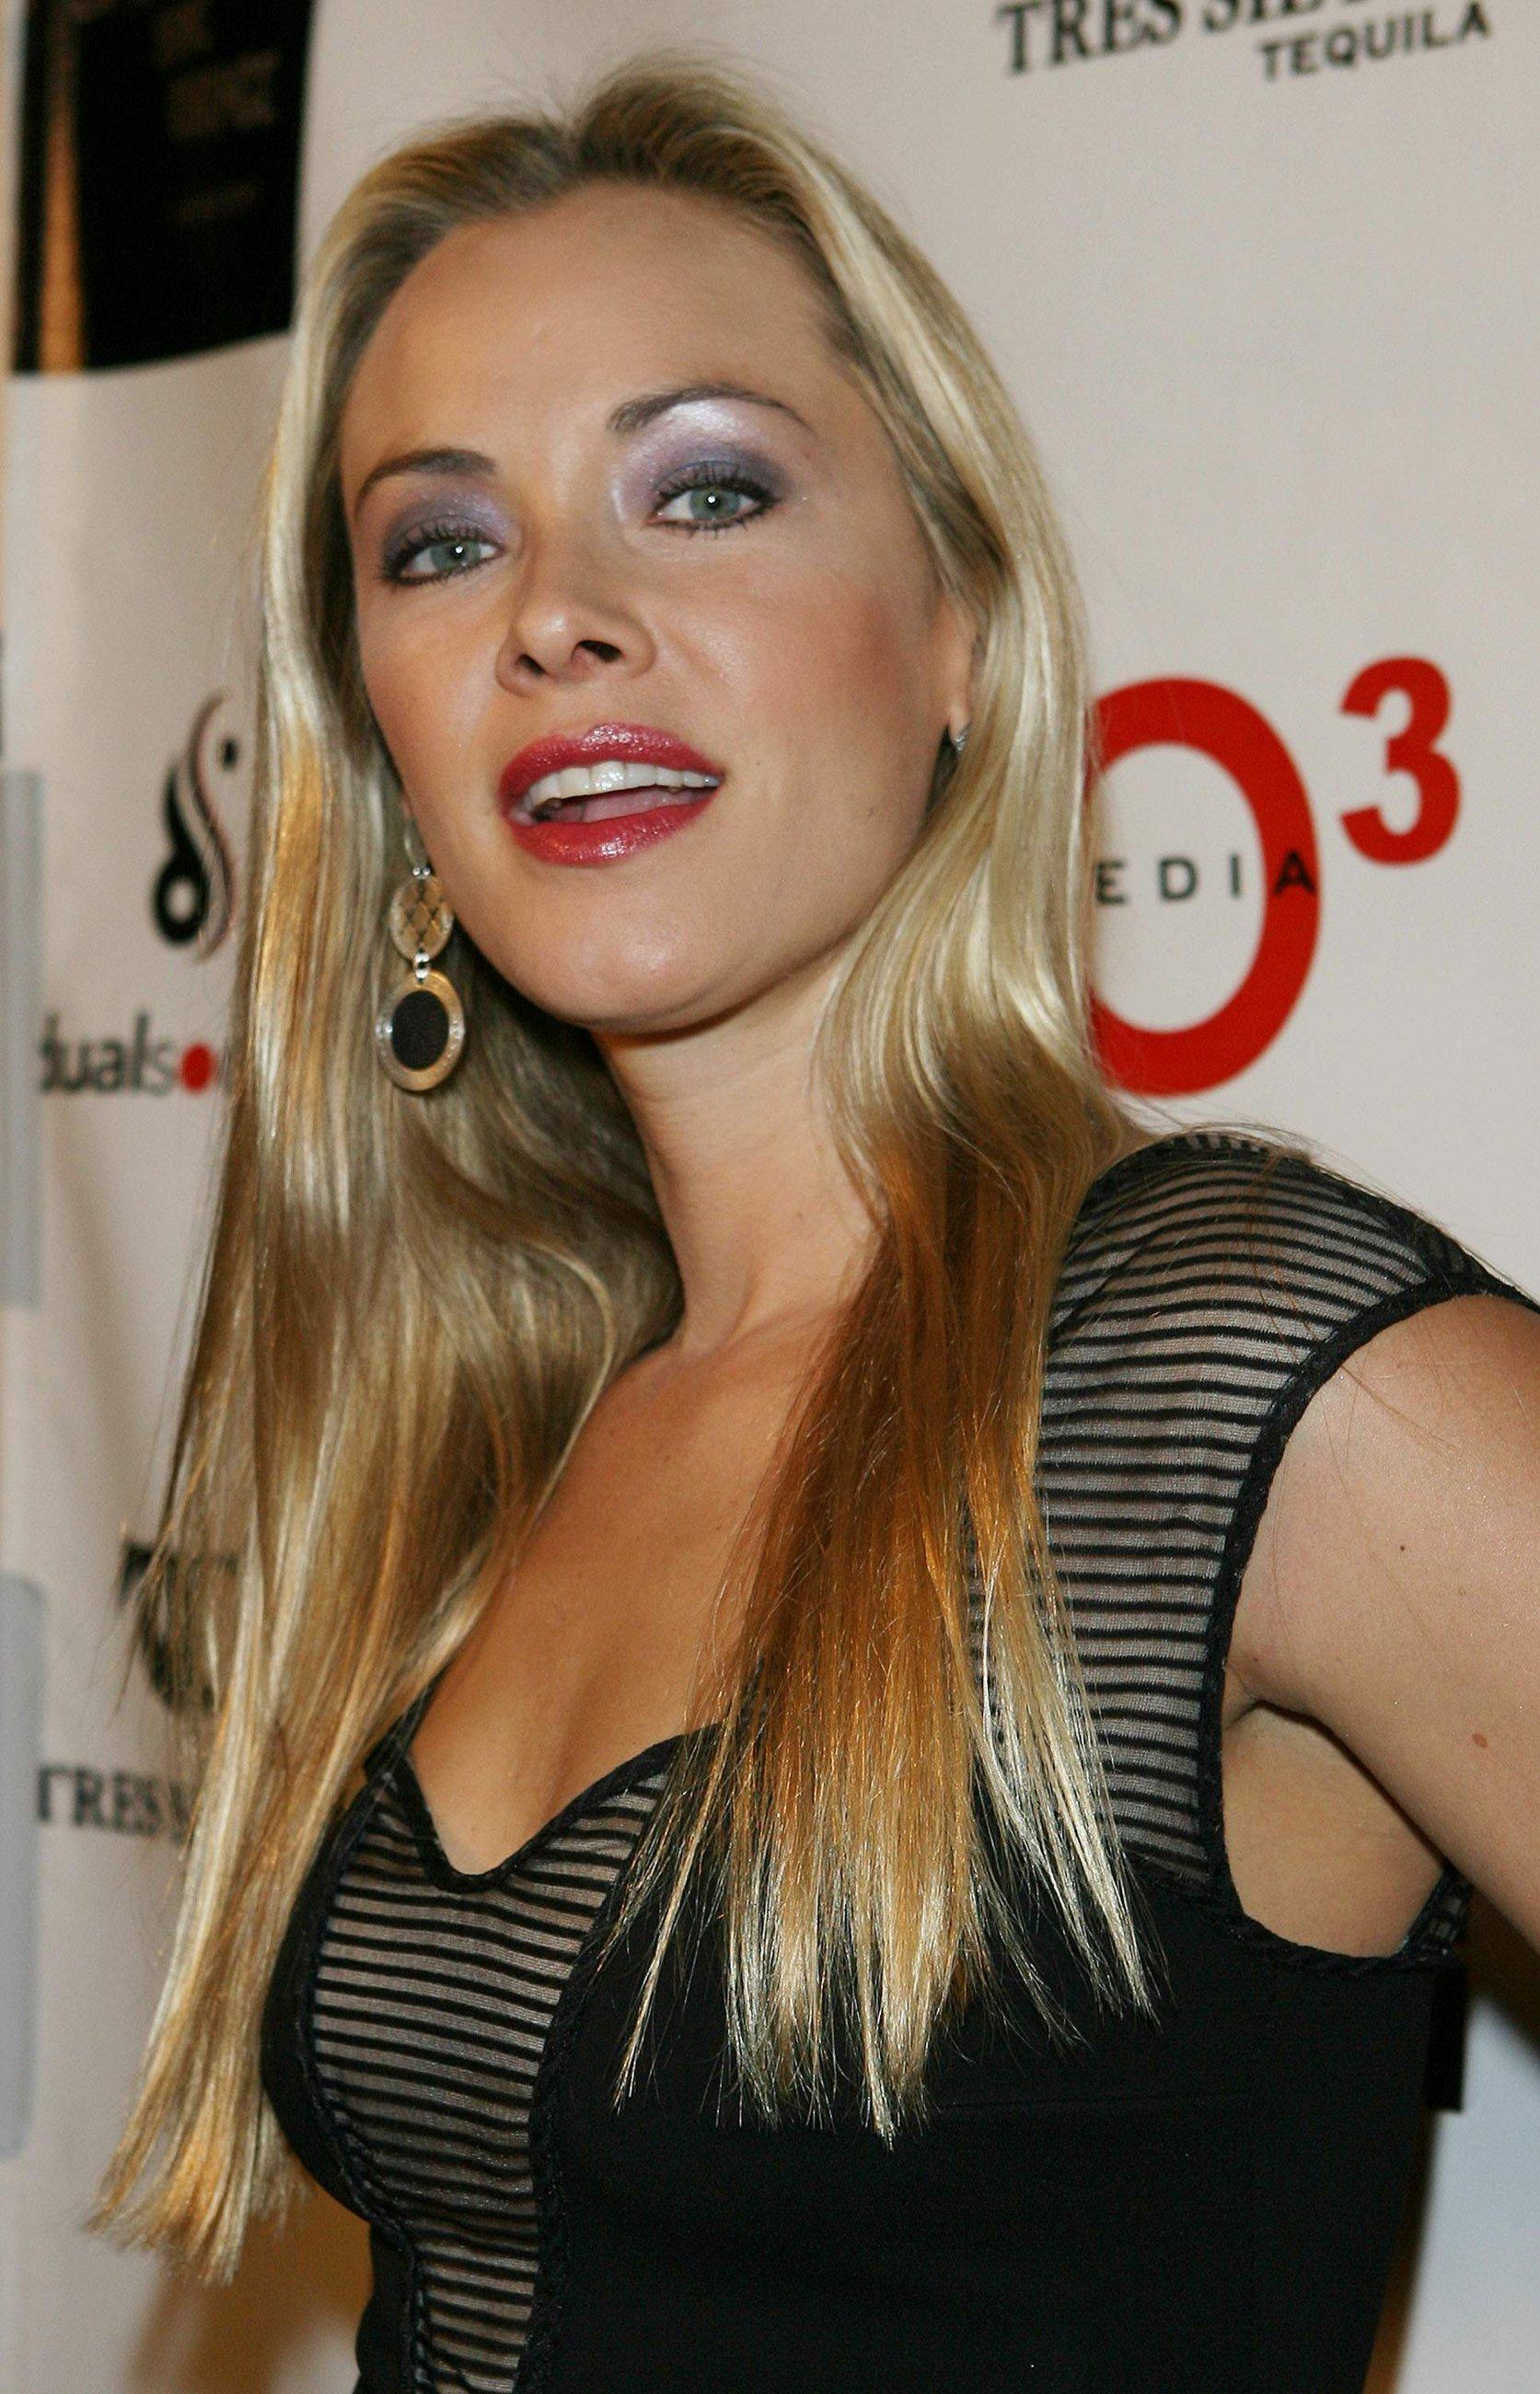 Scarlett johansson 2014 all full hot scenes latest - 1 part 7